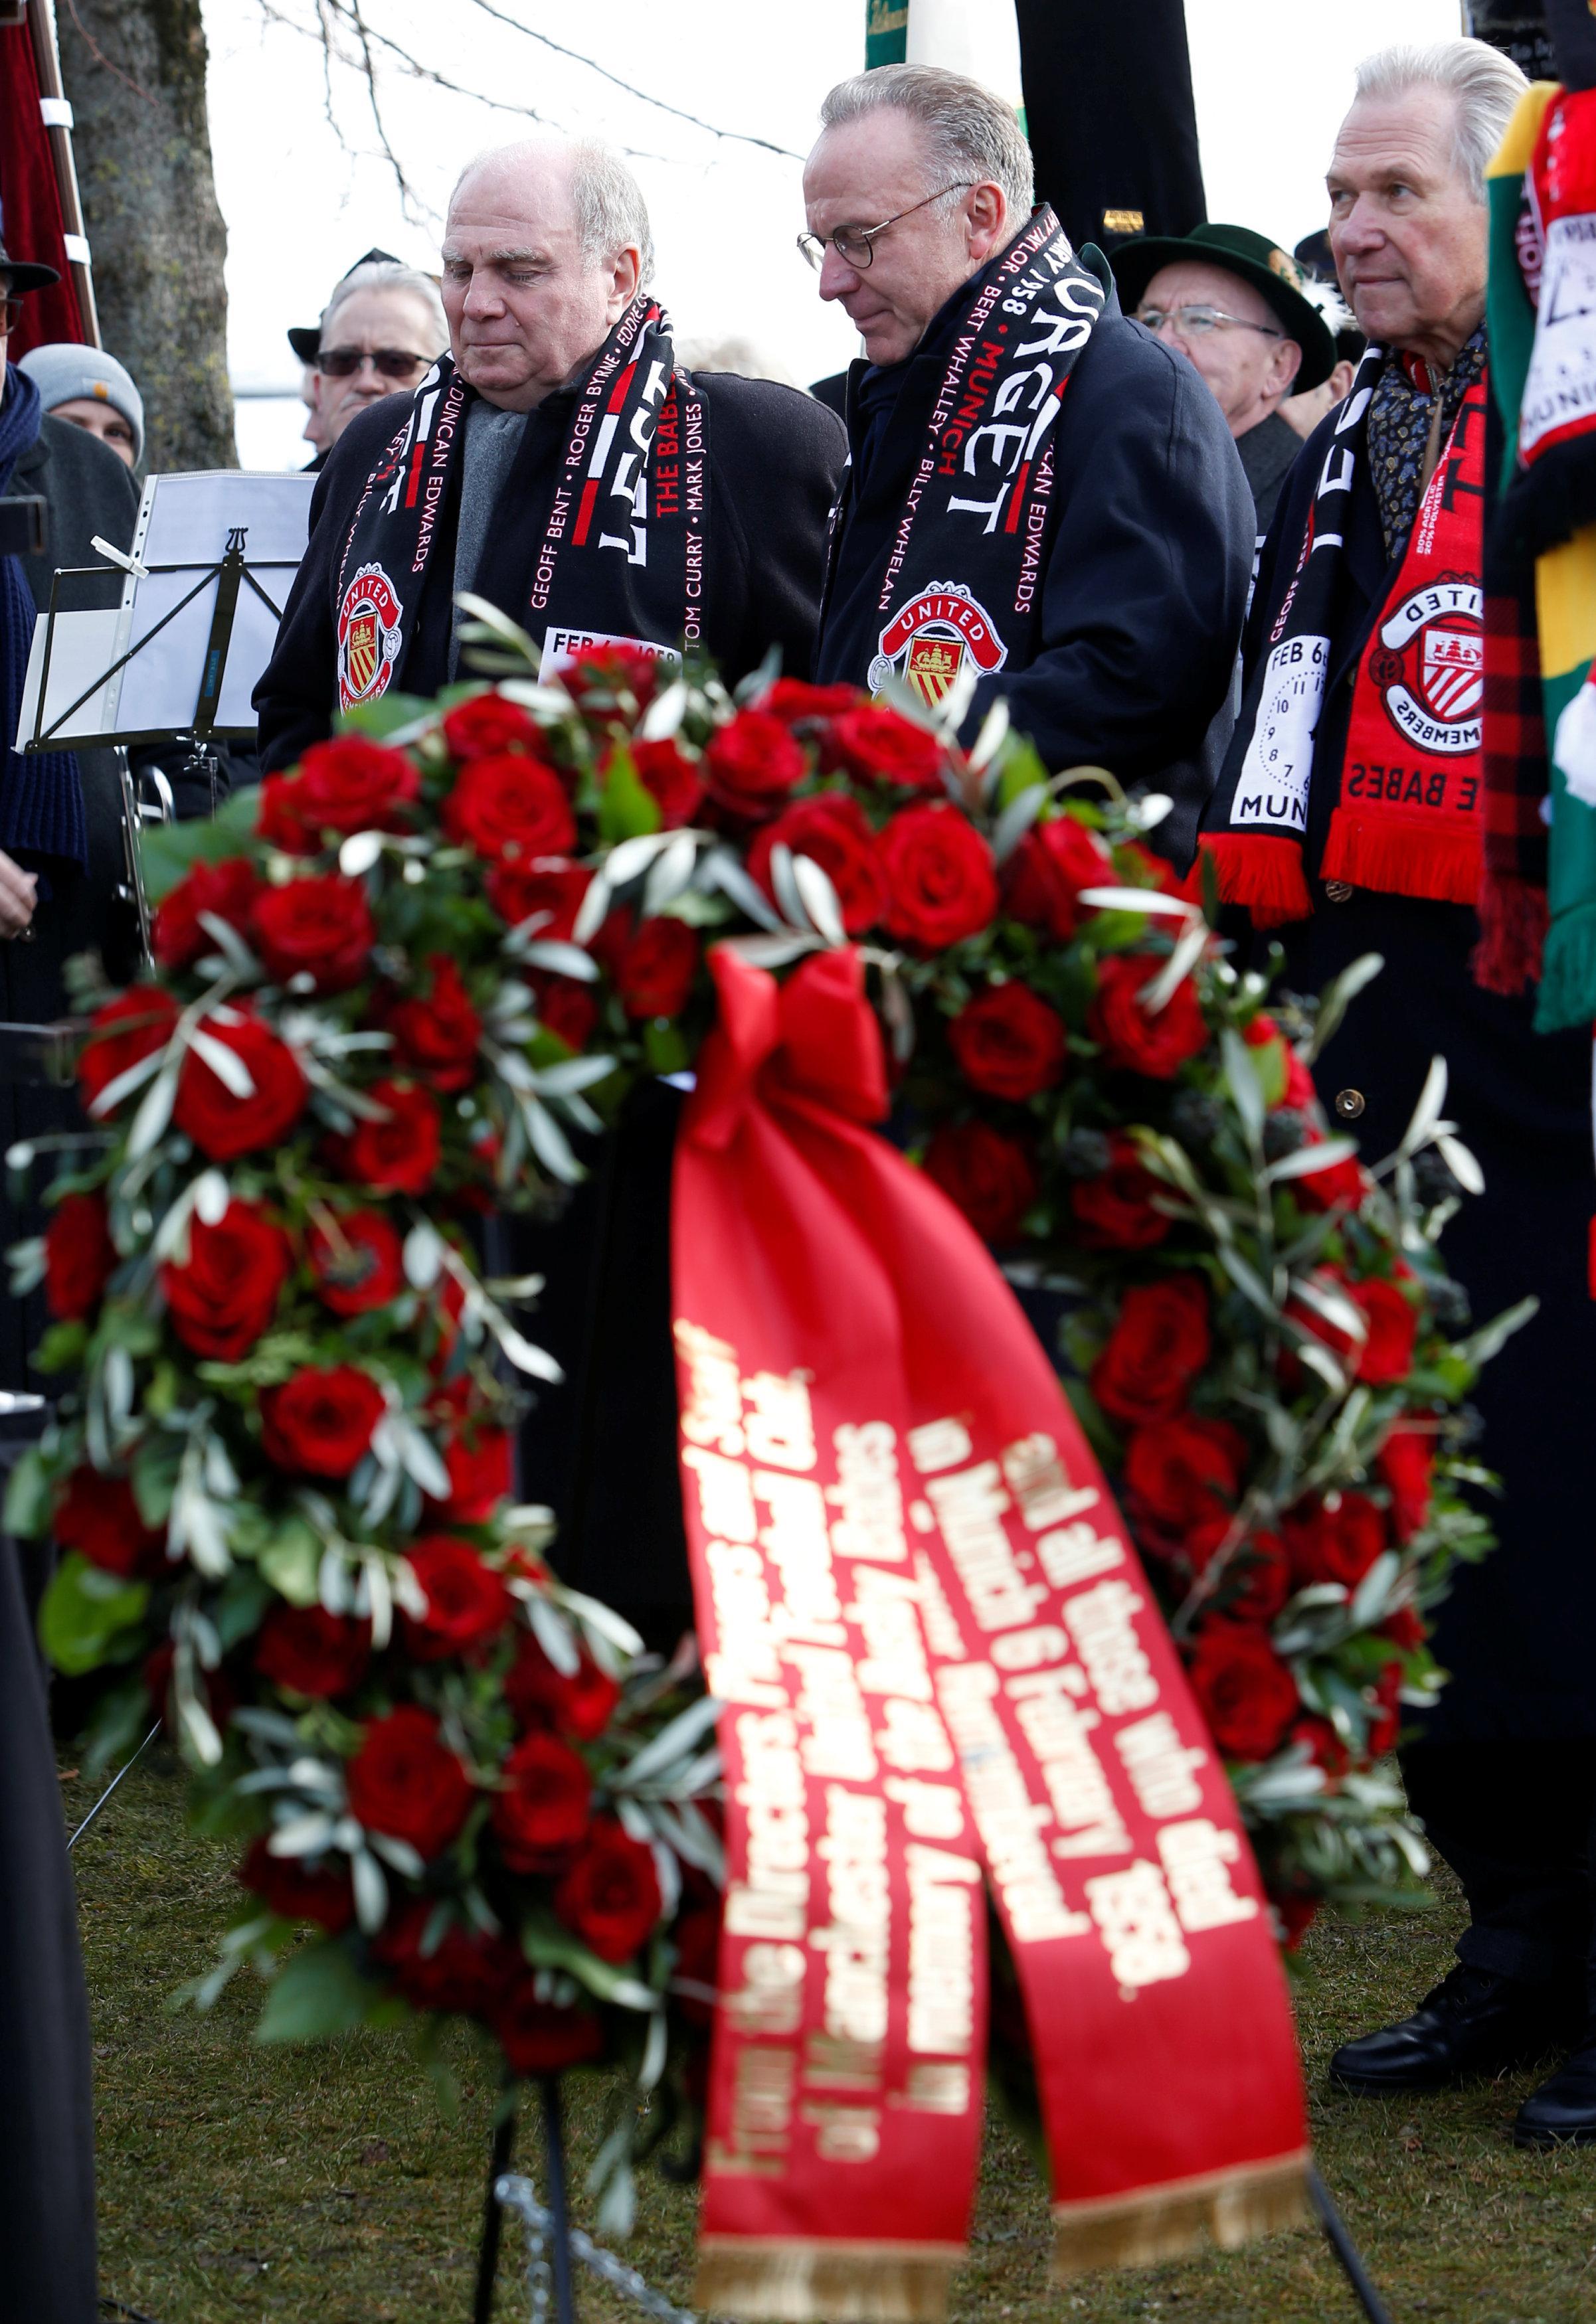 Bayern Munich CEO Karl-Heinz Rummenigge bows his head at Manchesterplatz, Munich where a memorial service was held for the tragedy